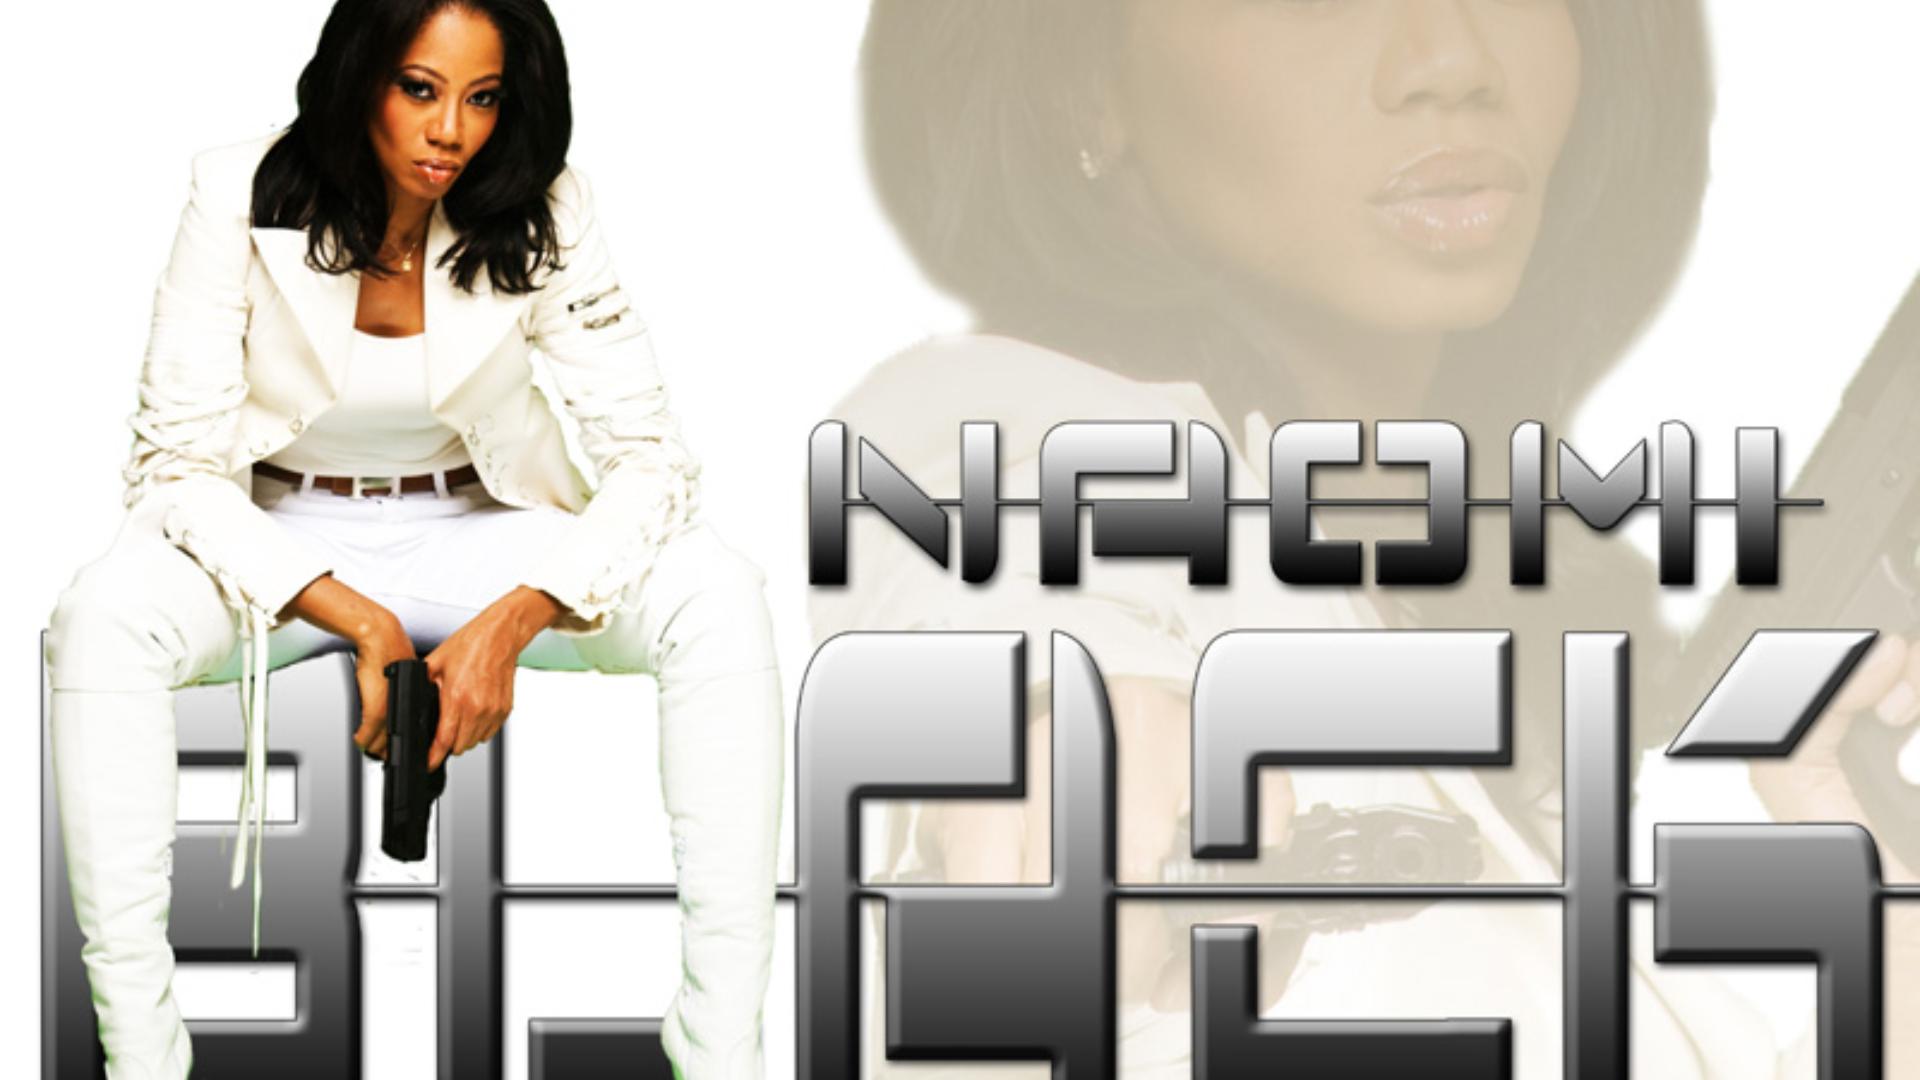 UASC - Naomi Black